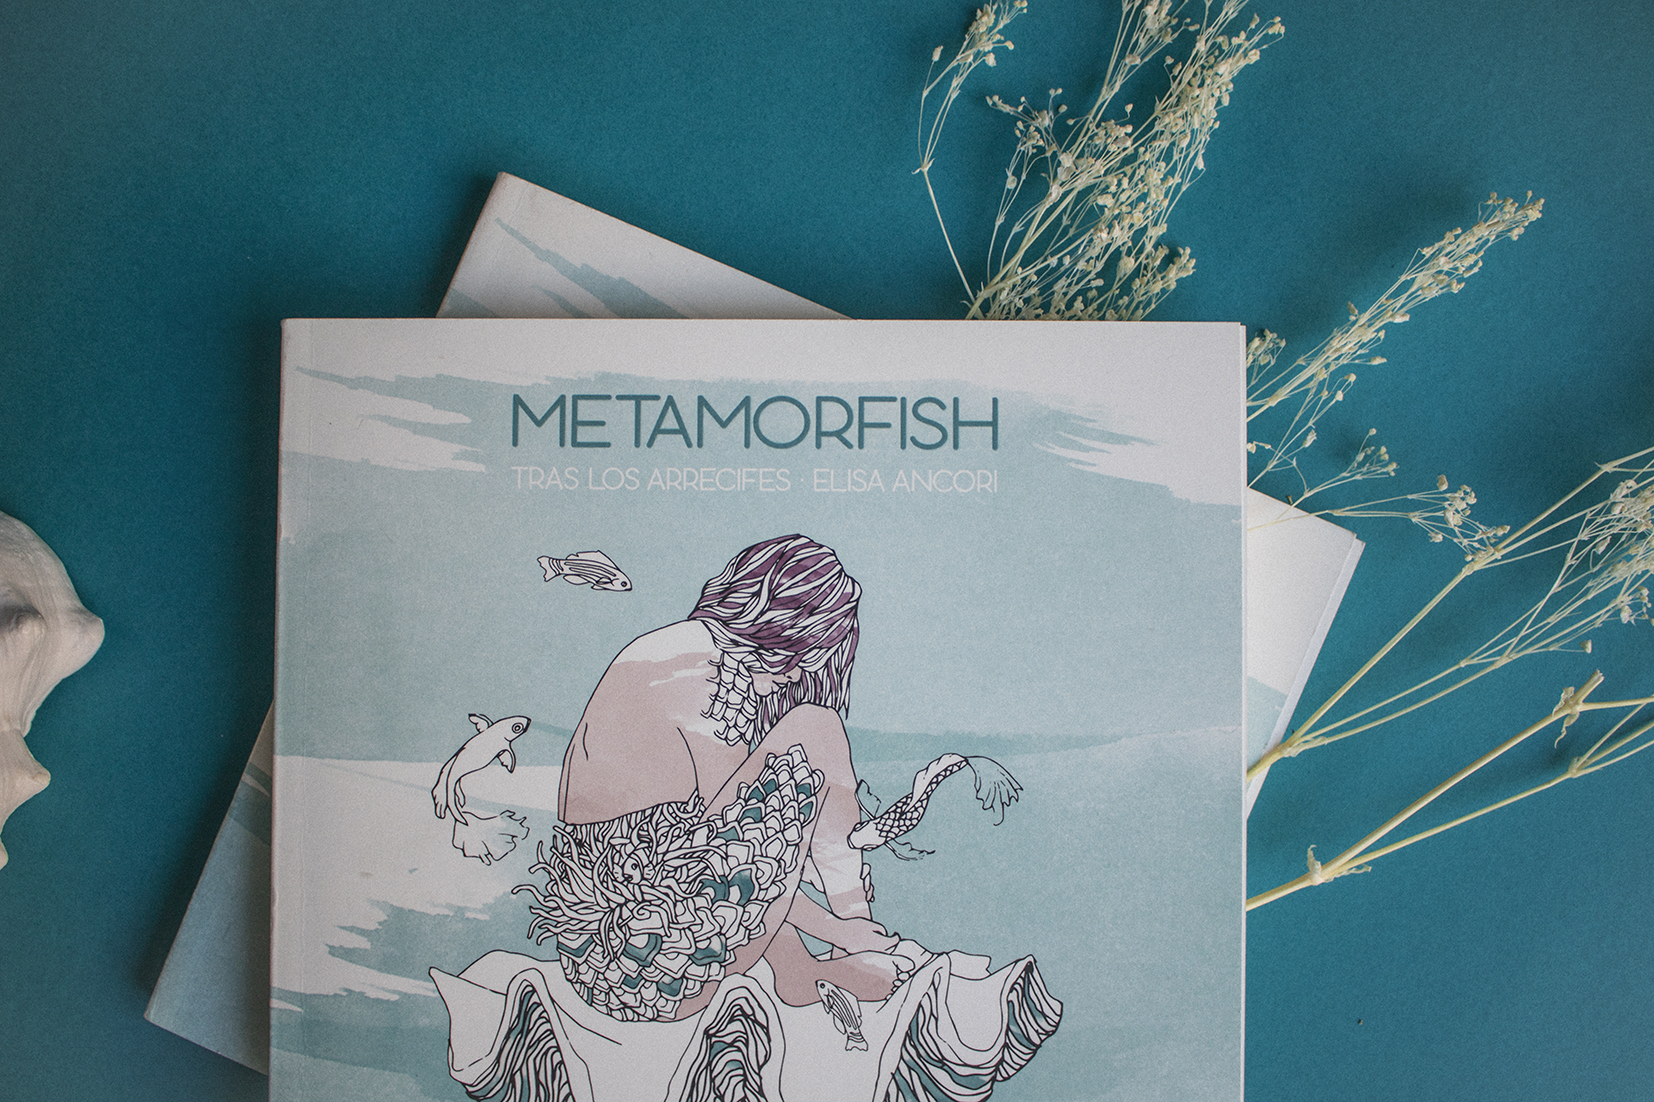 metamorfish_libro_elisaancori14.jpg